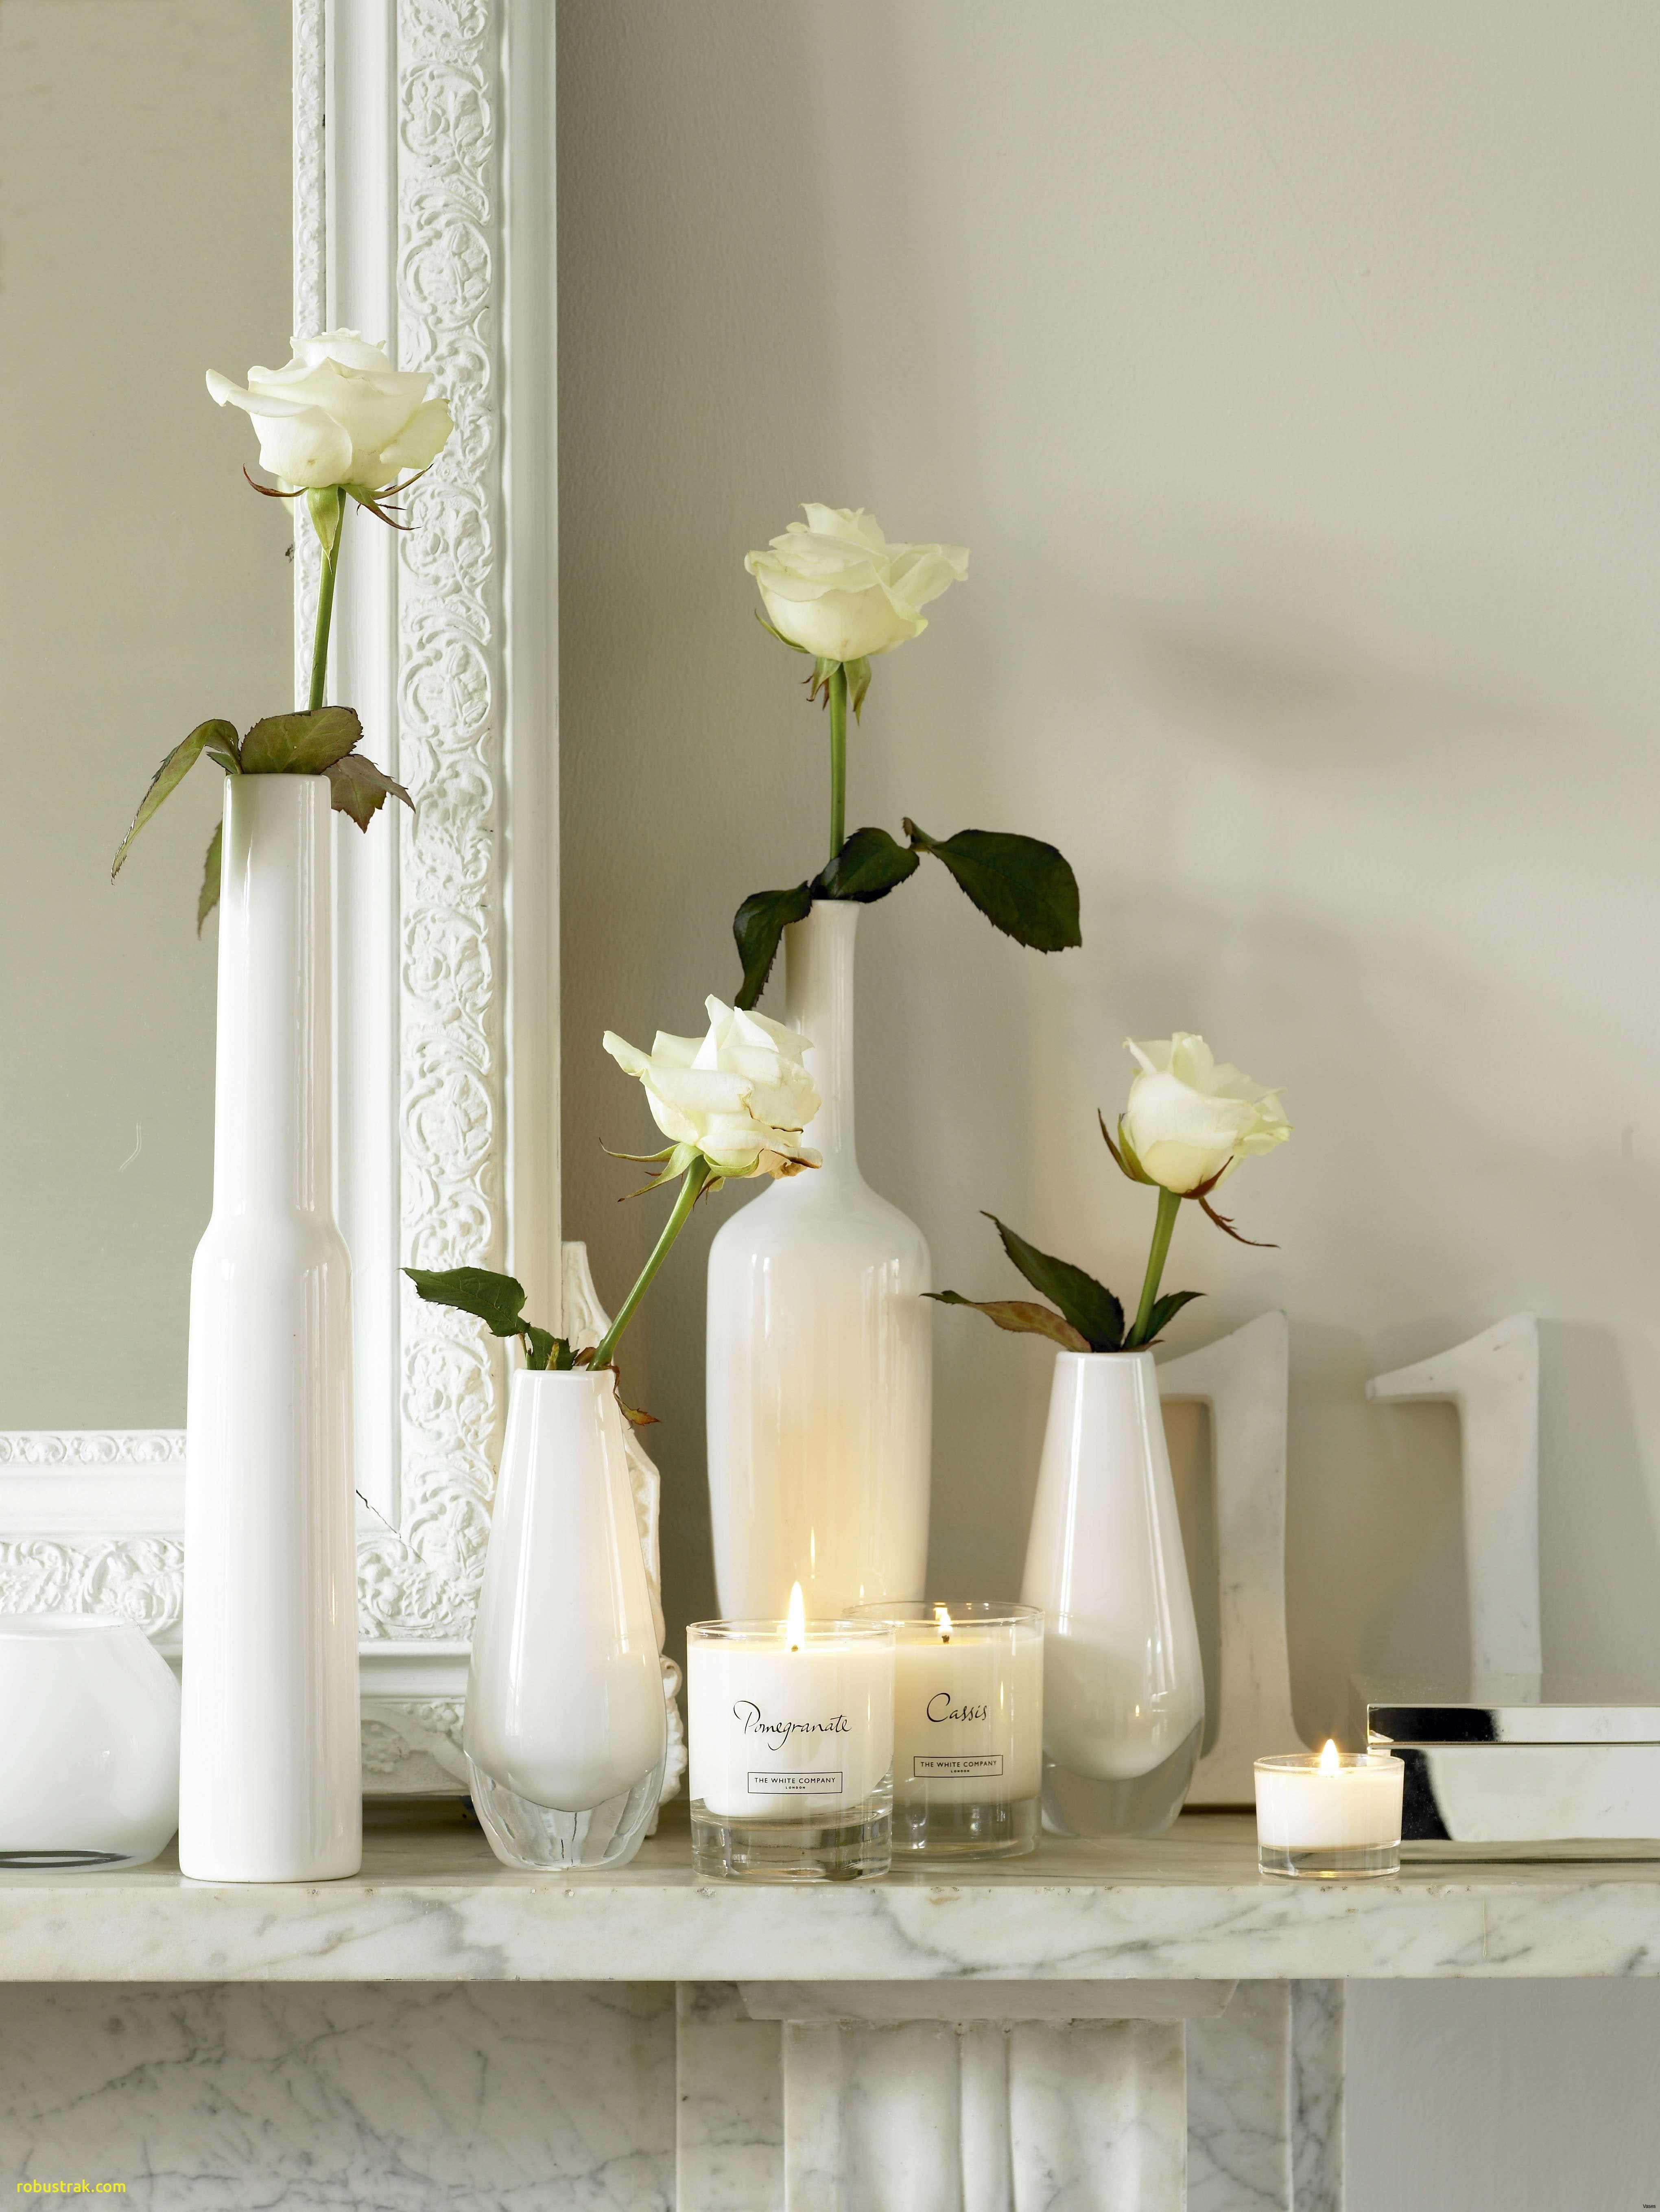 cut out vase of elegant decorating with vases home design ideas regarding vases decoration 15 ideas decorating with vasesi 15d vases decoration h decorationi 0d